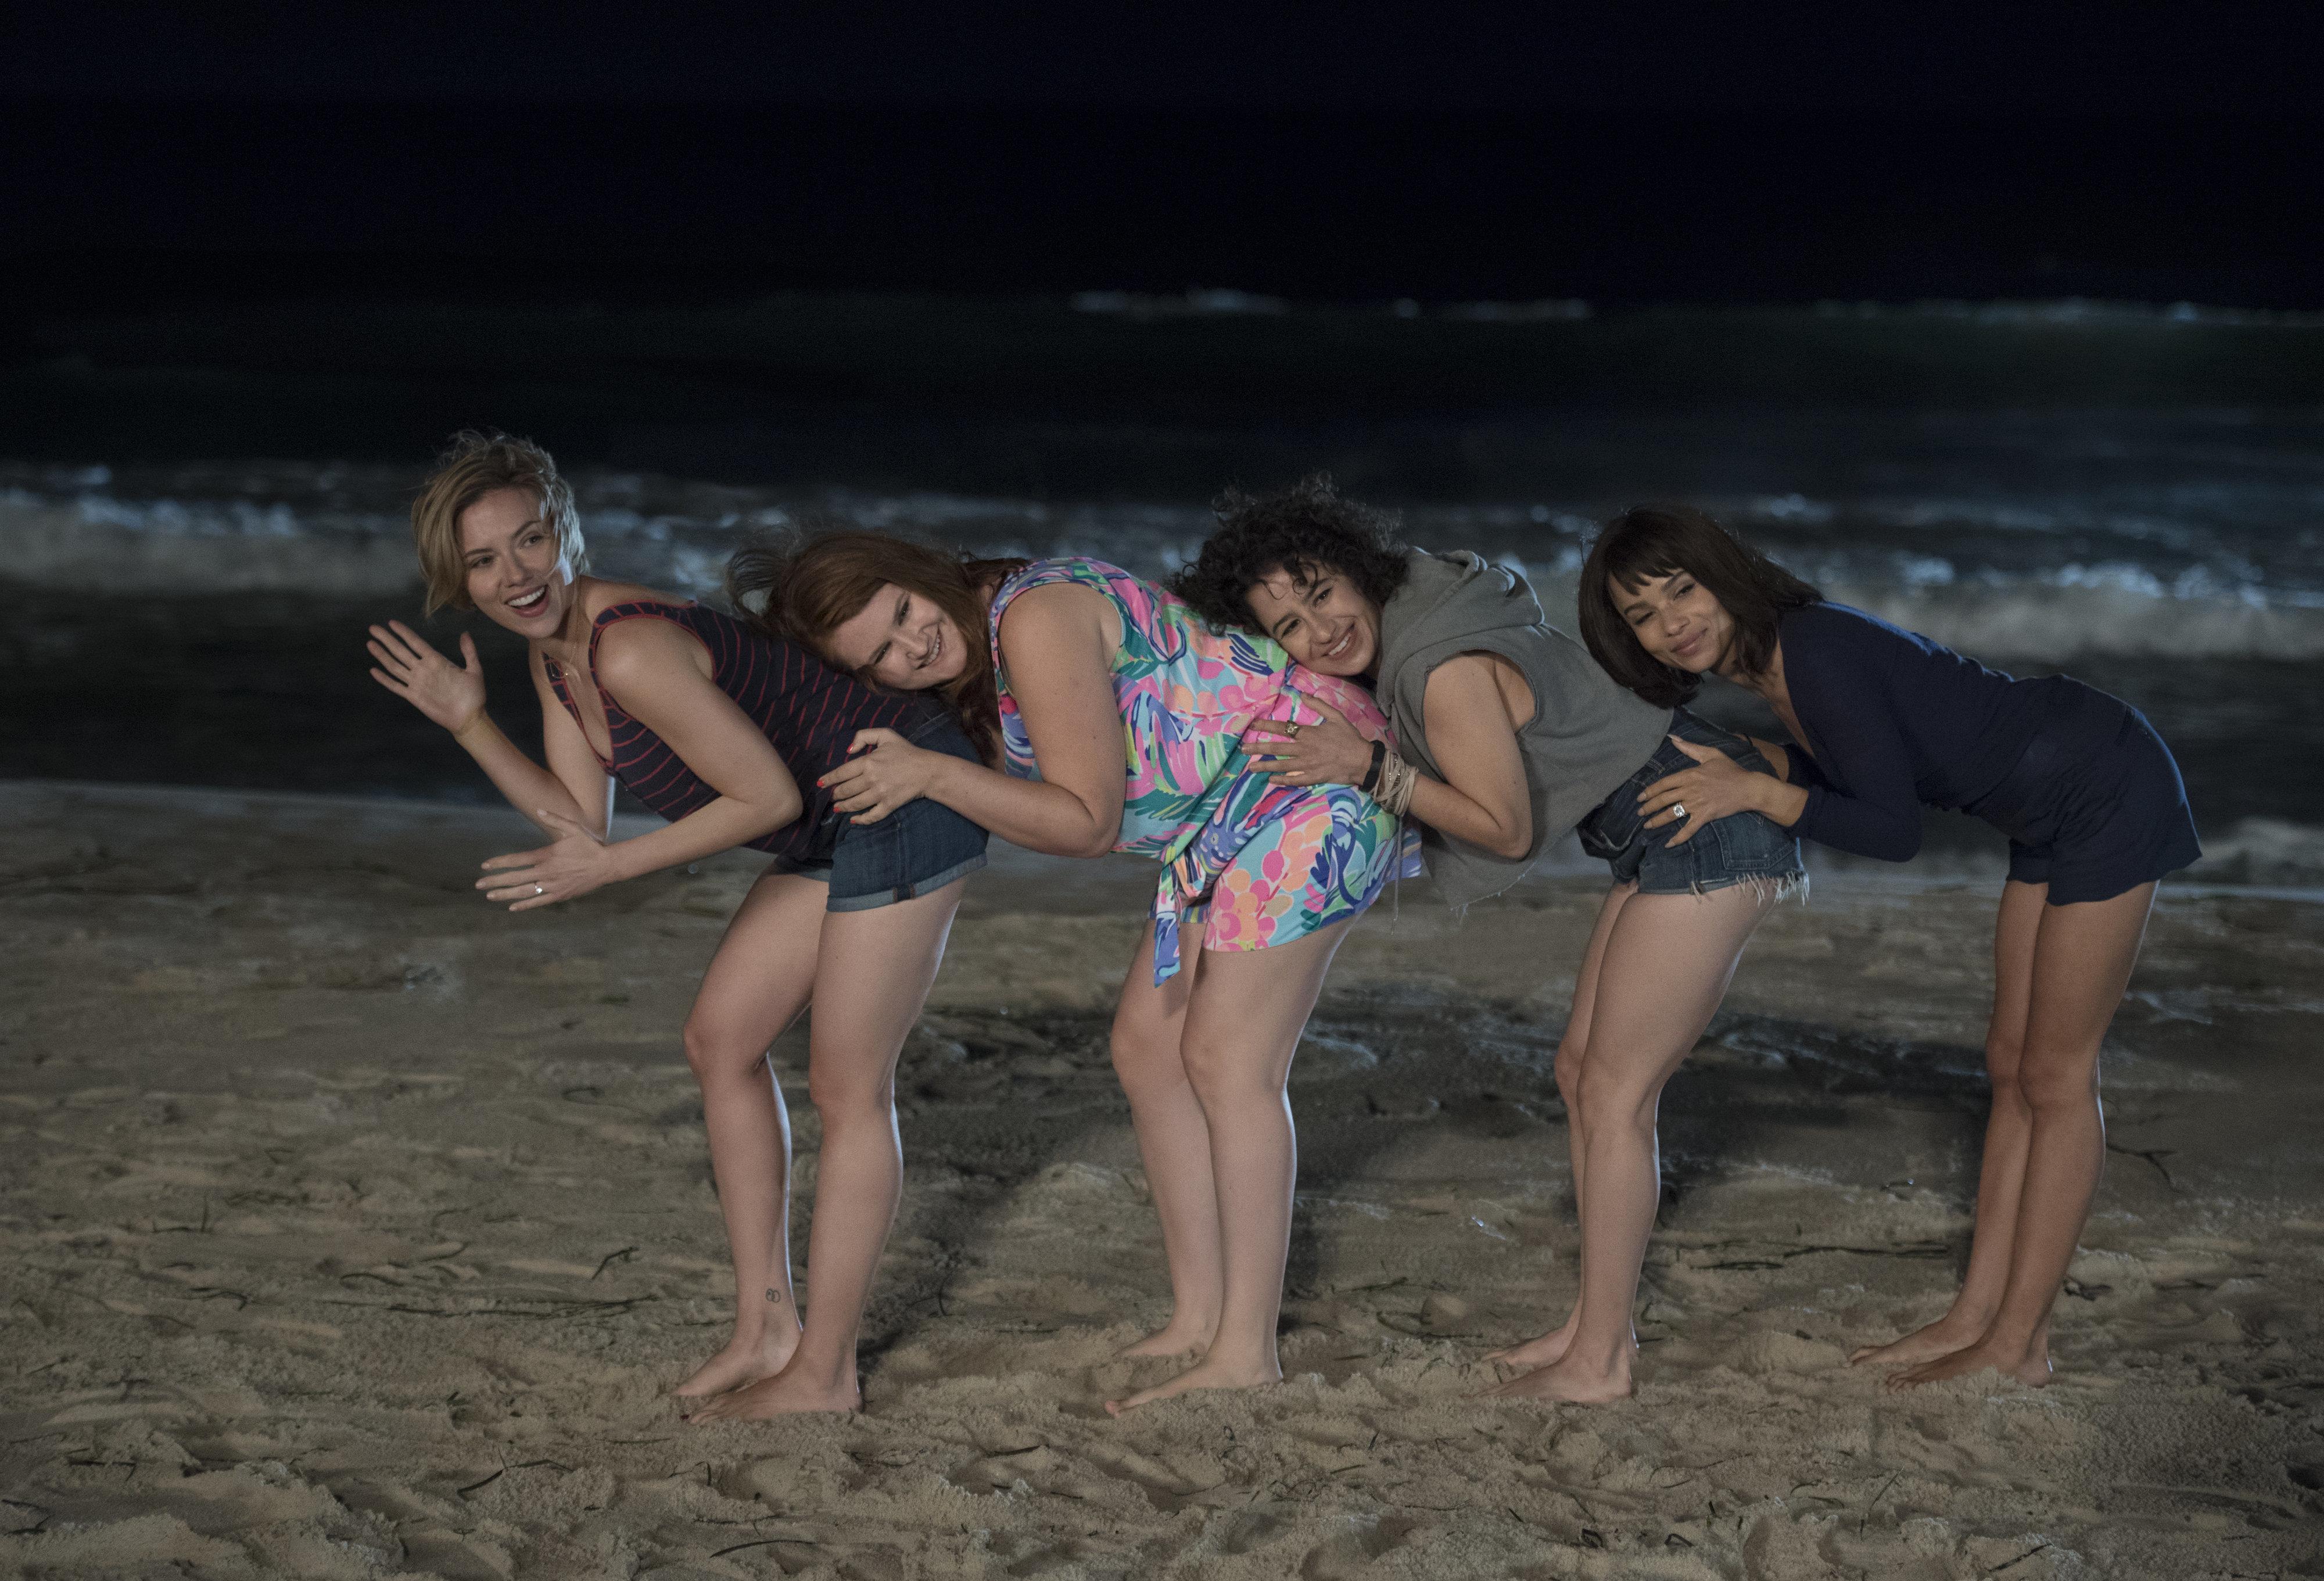 (L to R) Scarlett Johansson, Jillian Bell, Ilana Glazer, Zoe Kravitz in Columbia Pictures' ROUGH NIGHT.